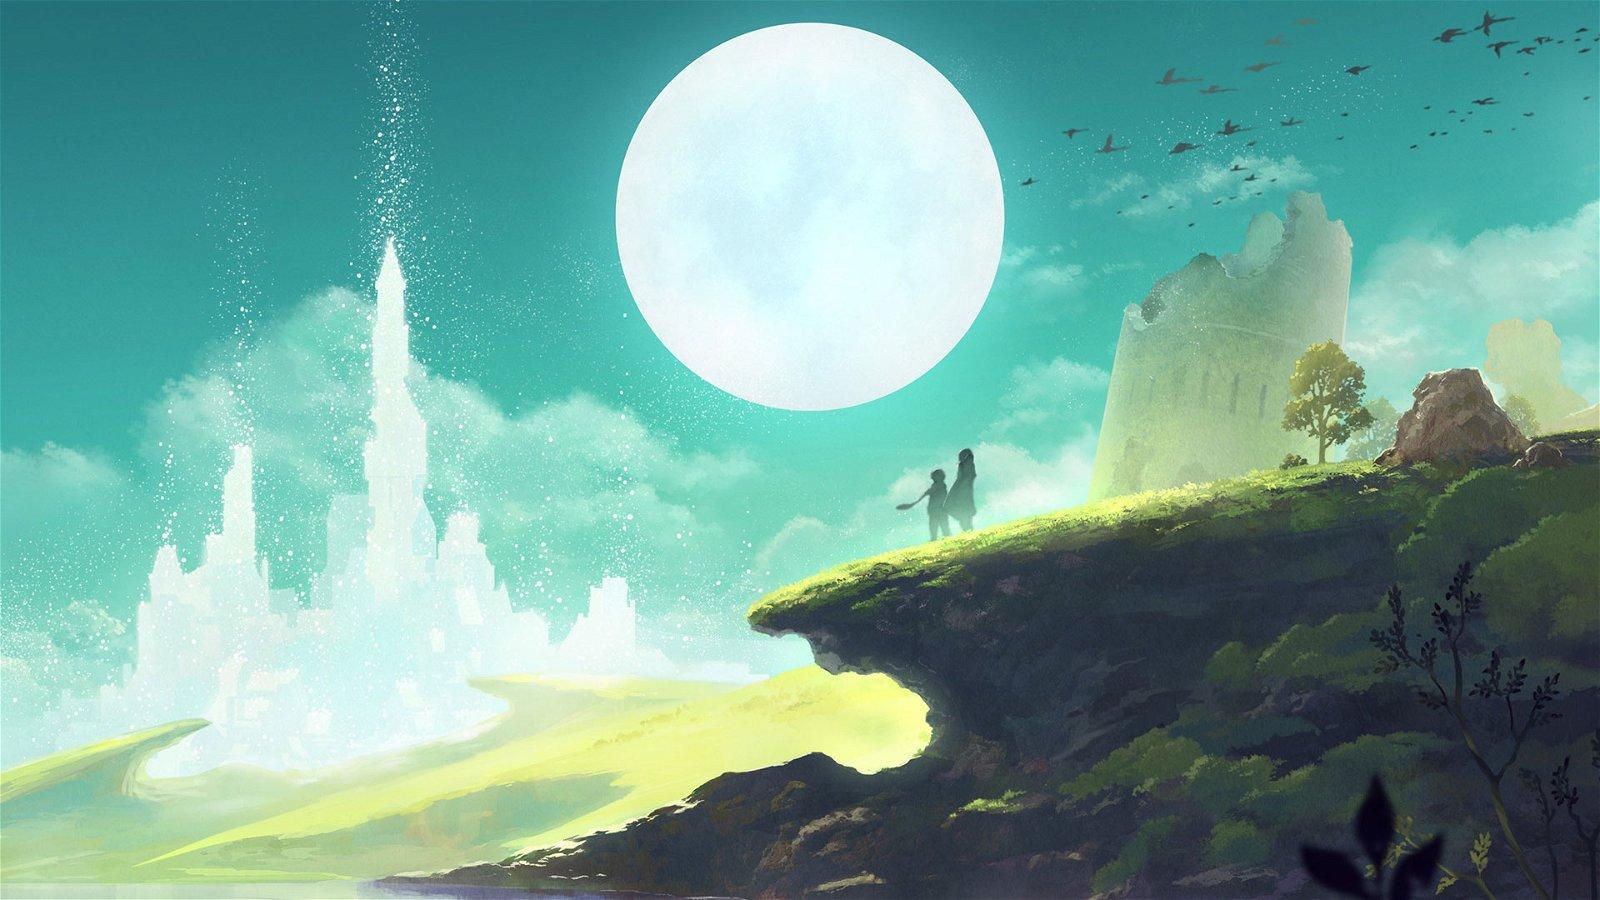 Lost Sphere E3 2017 Preview - Classic JRPG Memories 1